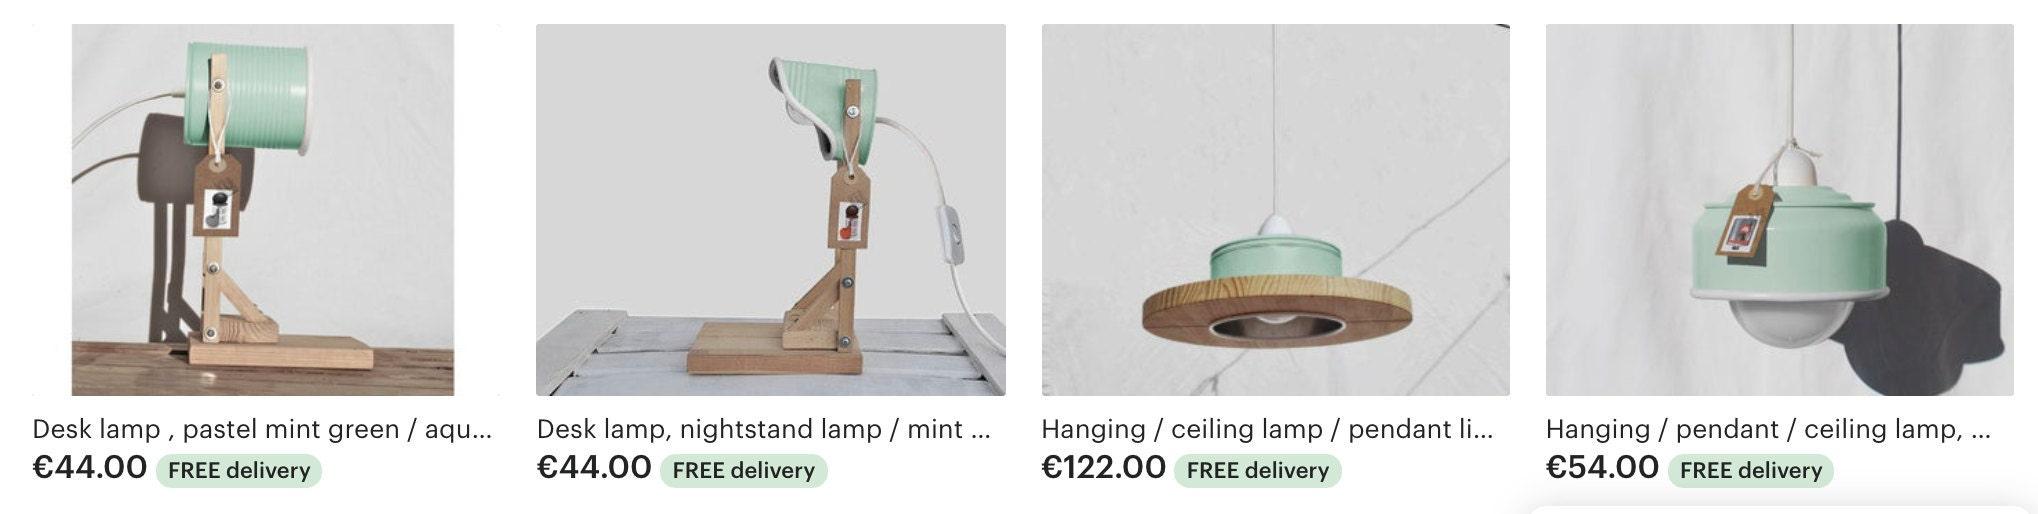 MINT LAMPS BY ILIUI